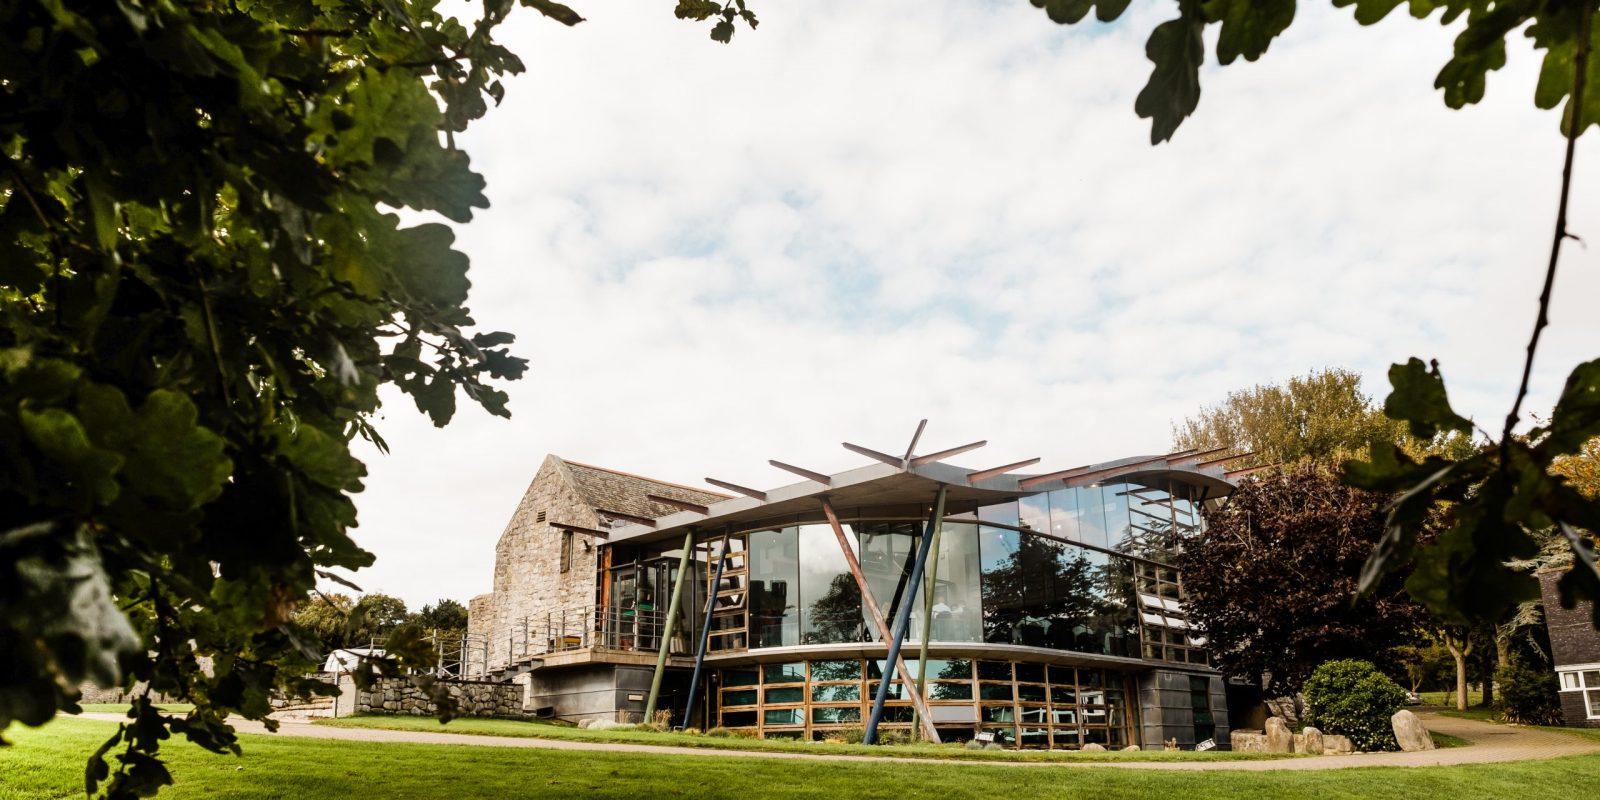 St Donats Arts Centre 12th Century Barn